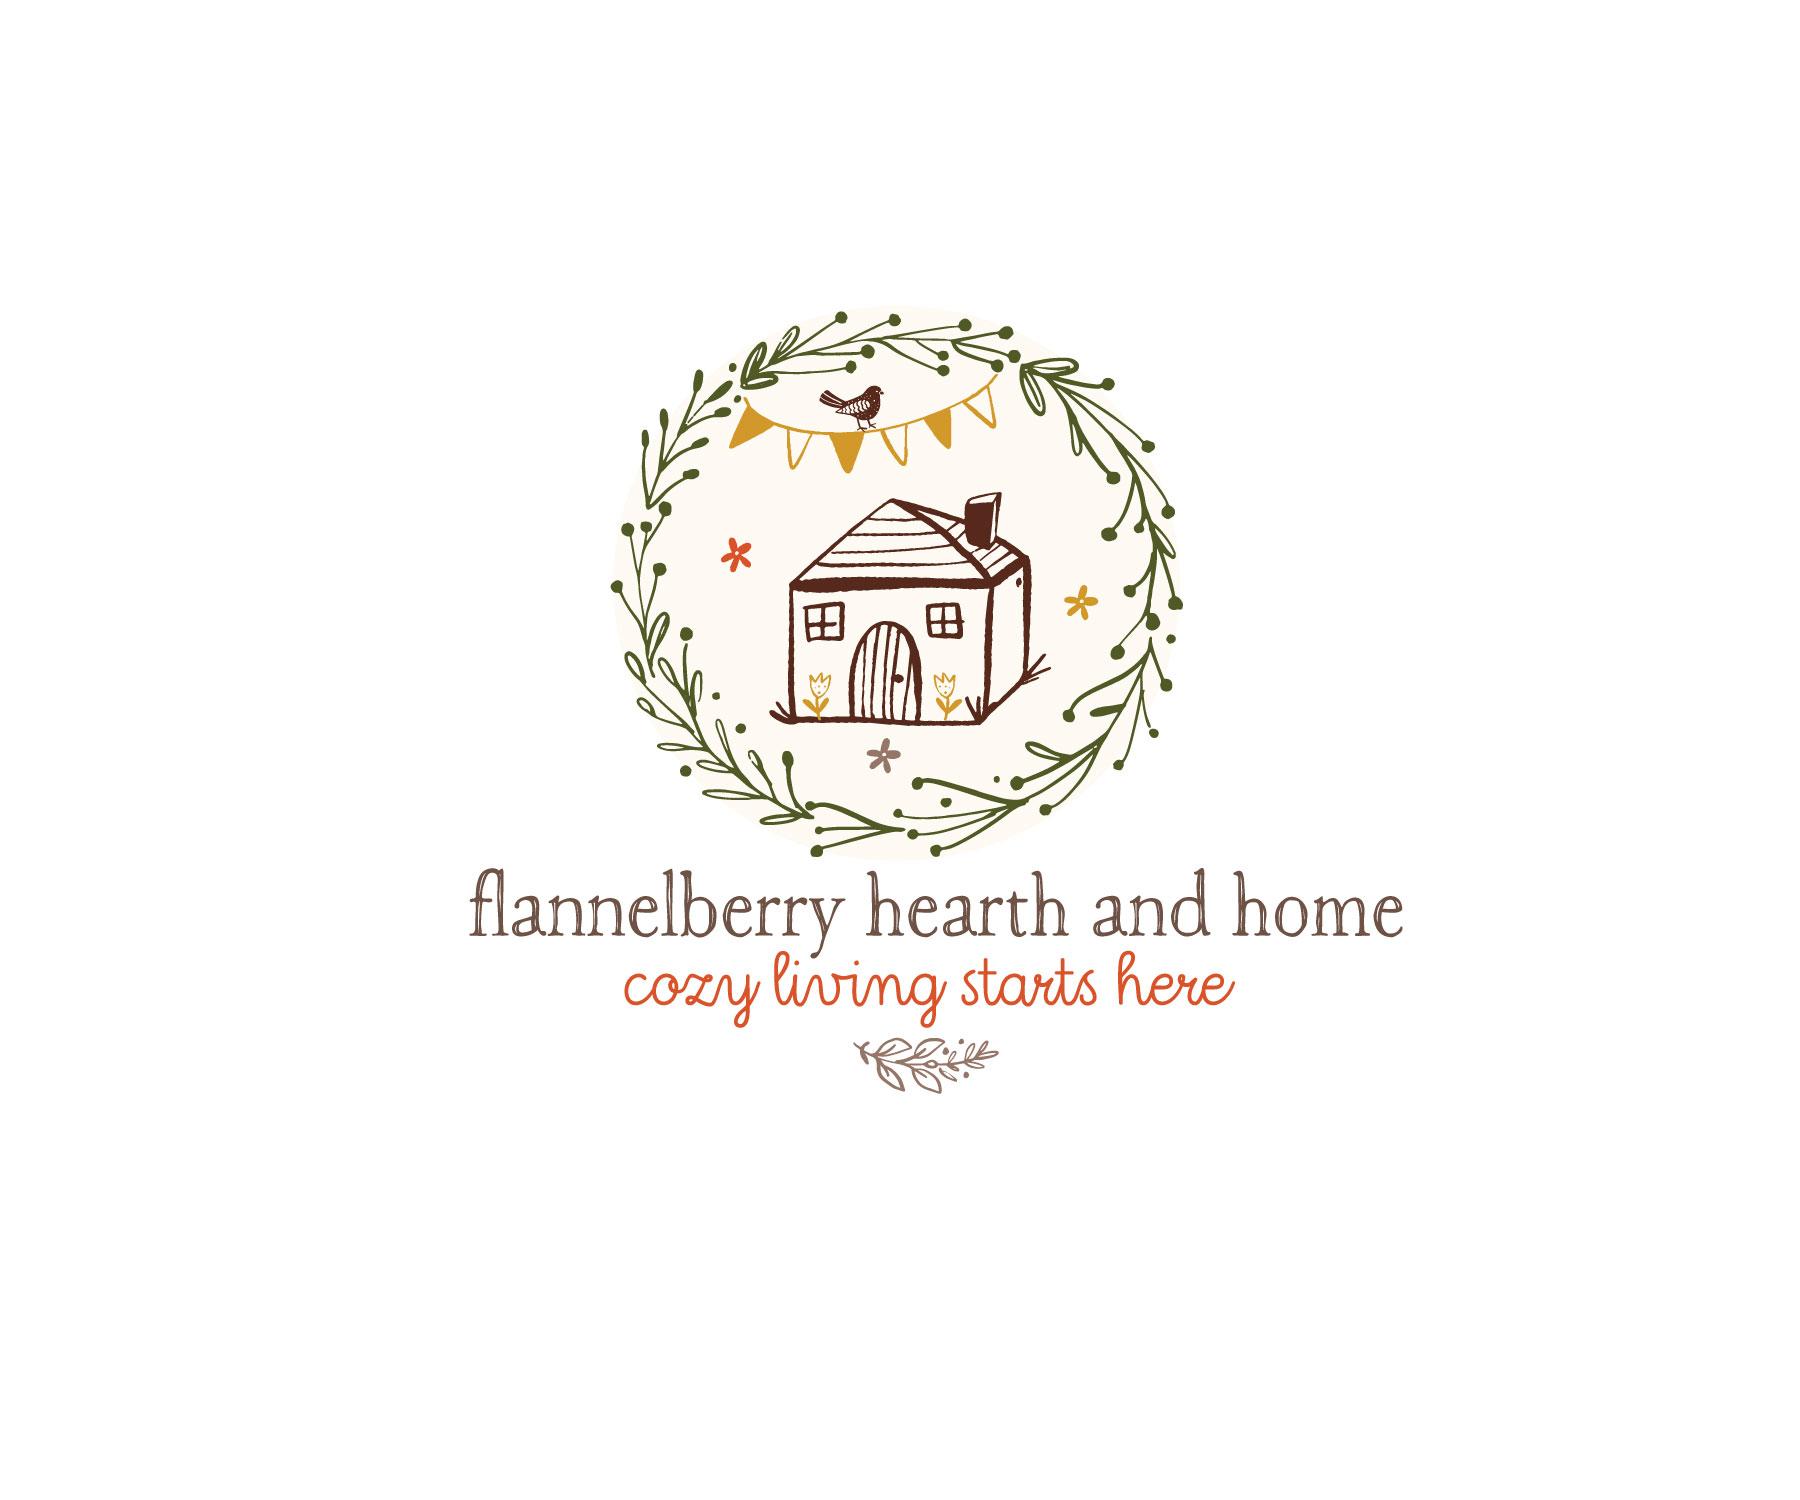 FlanelberryHearthandHome.jpg